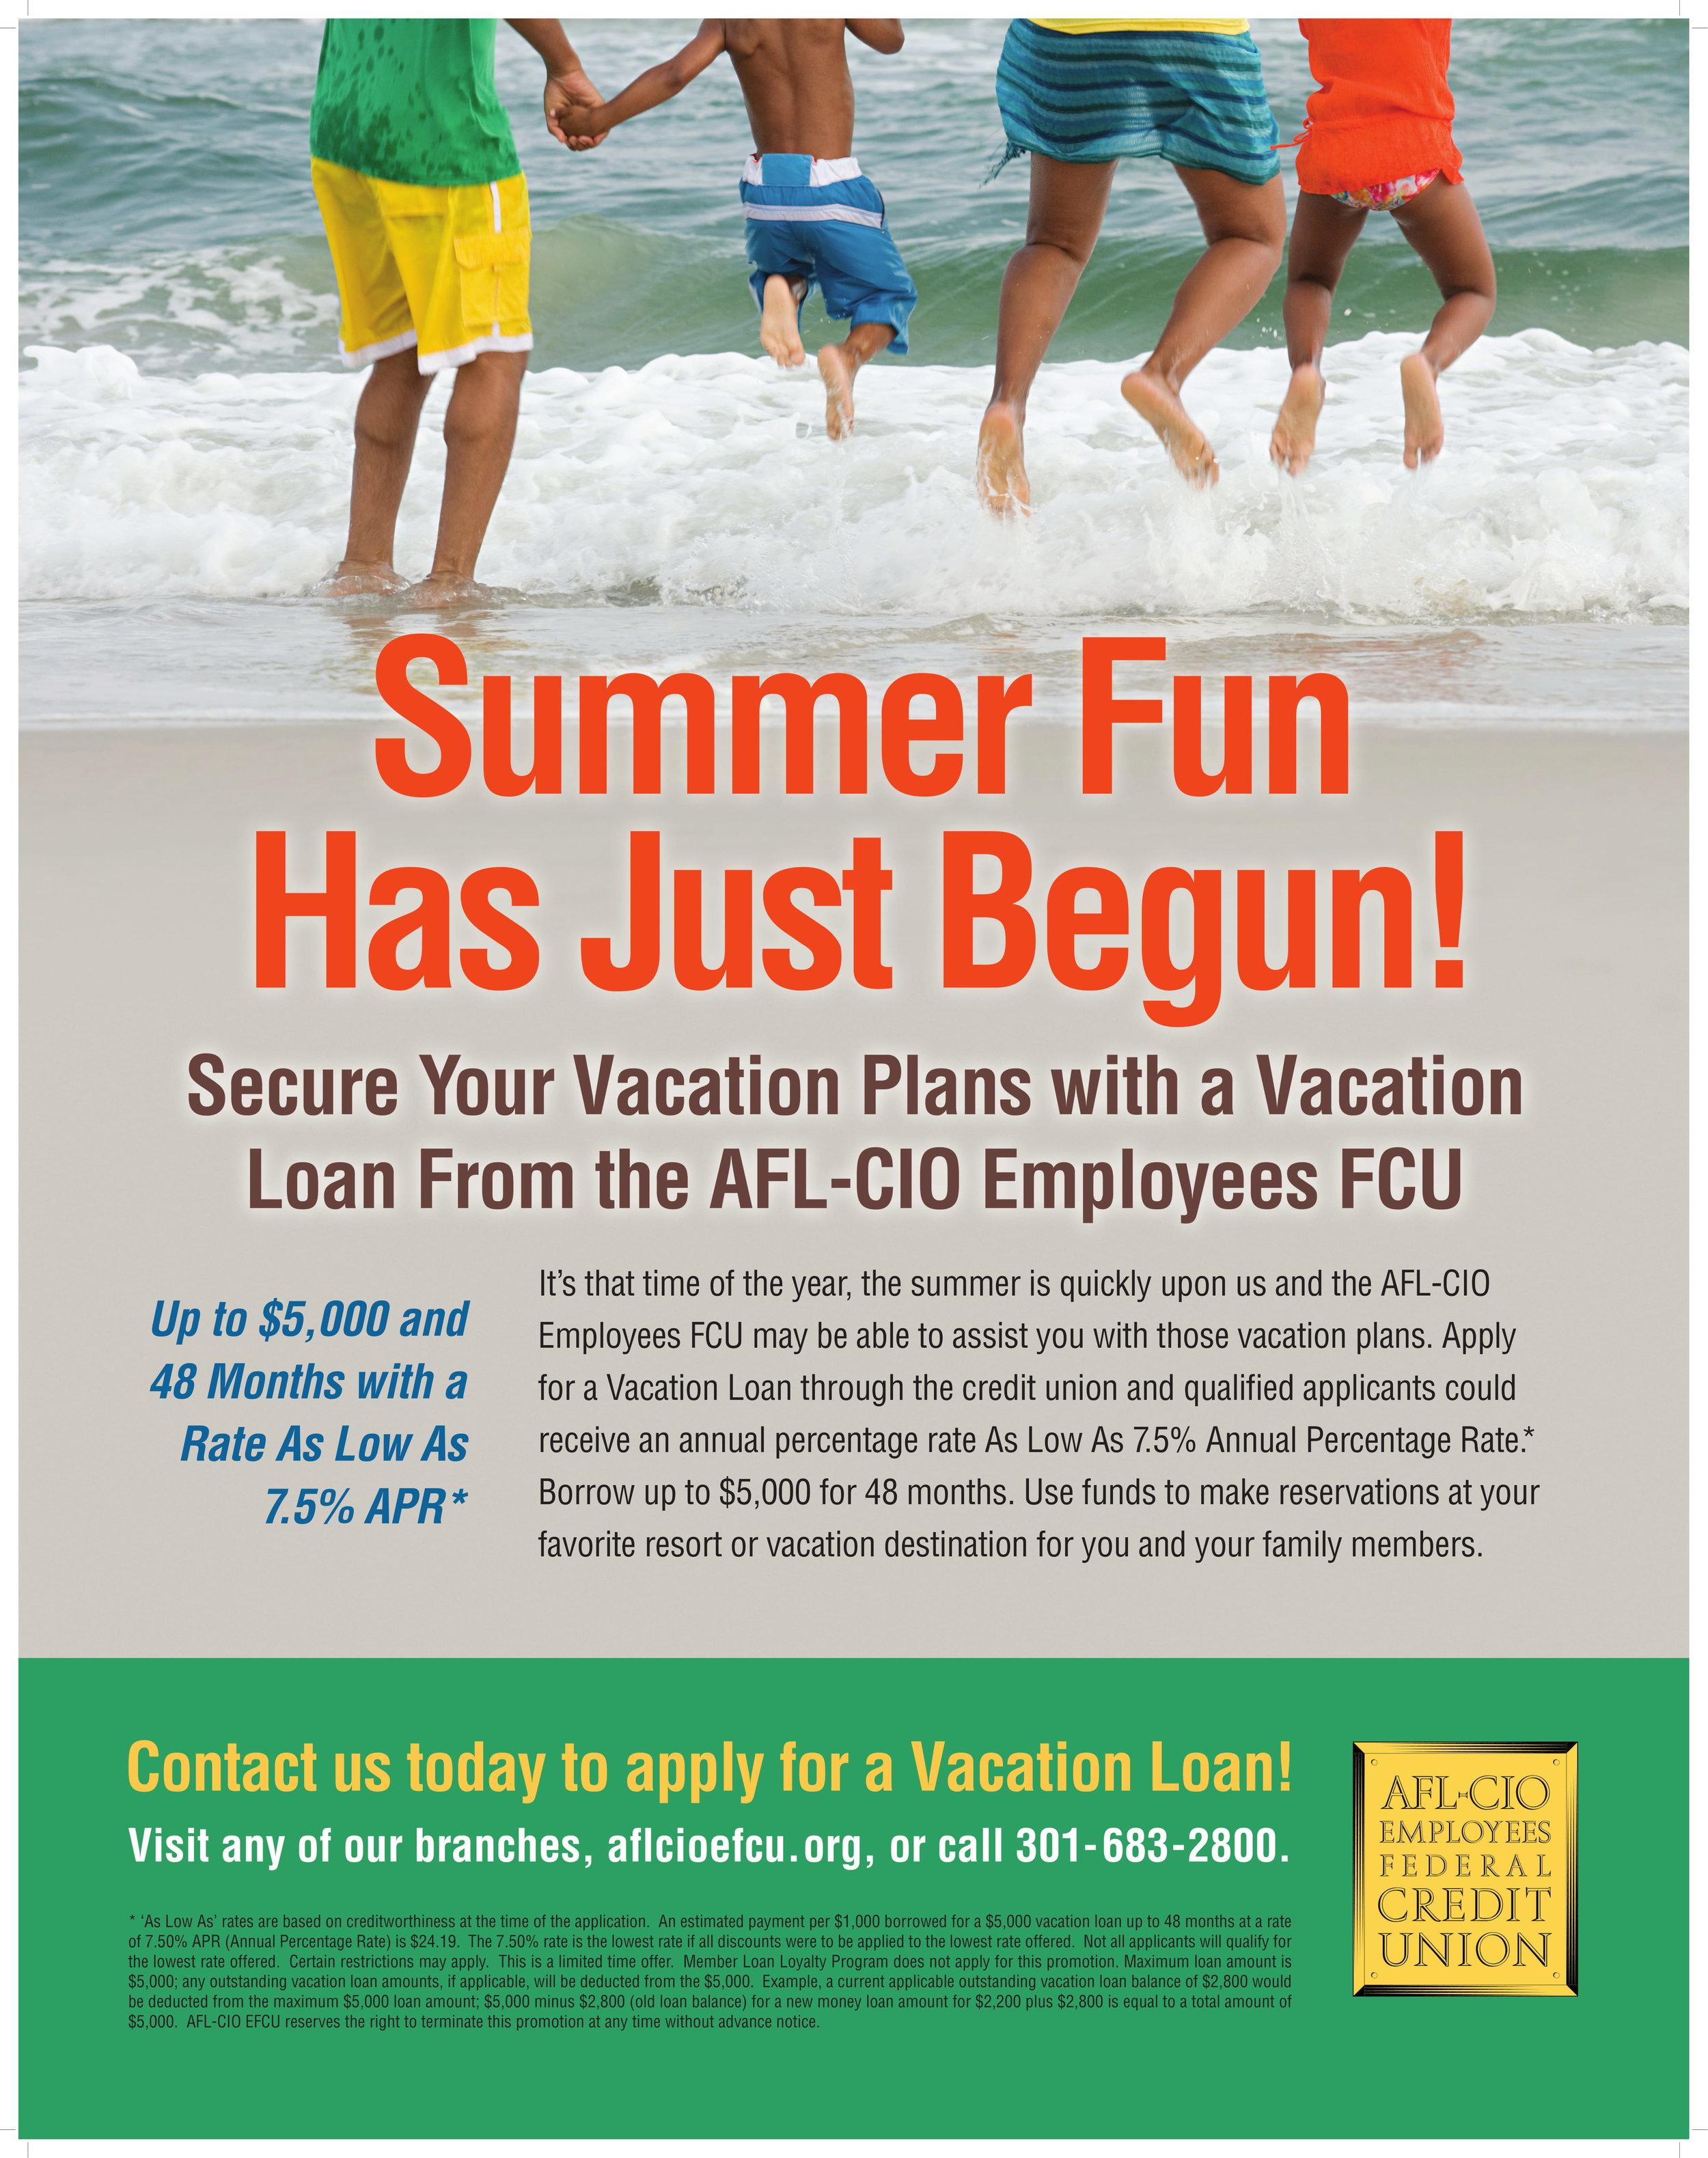 Vacation Loan Poster-1.jpg